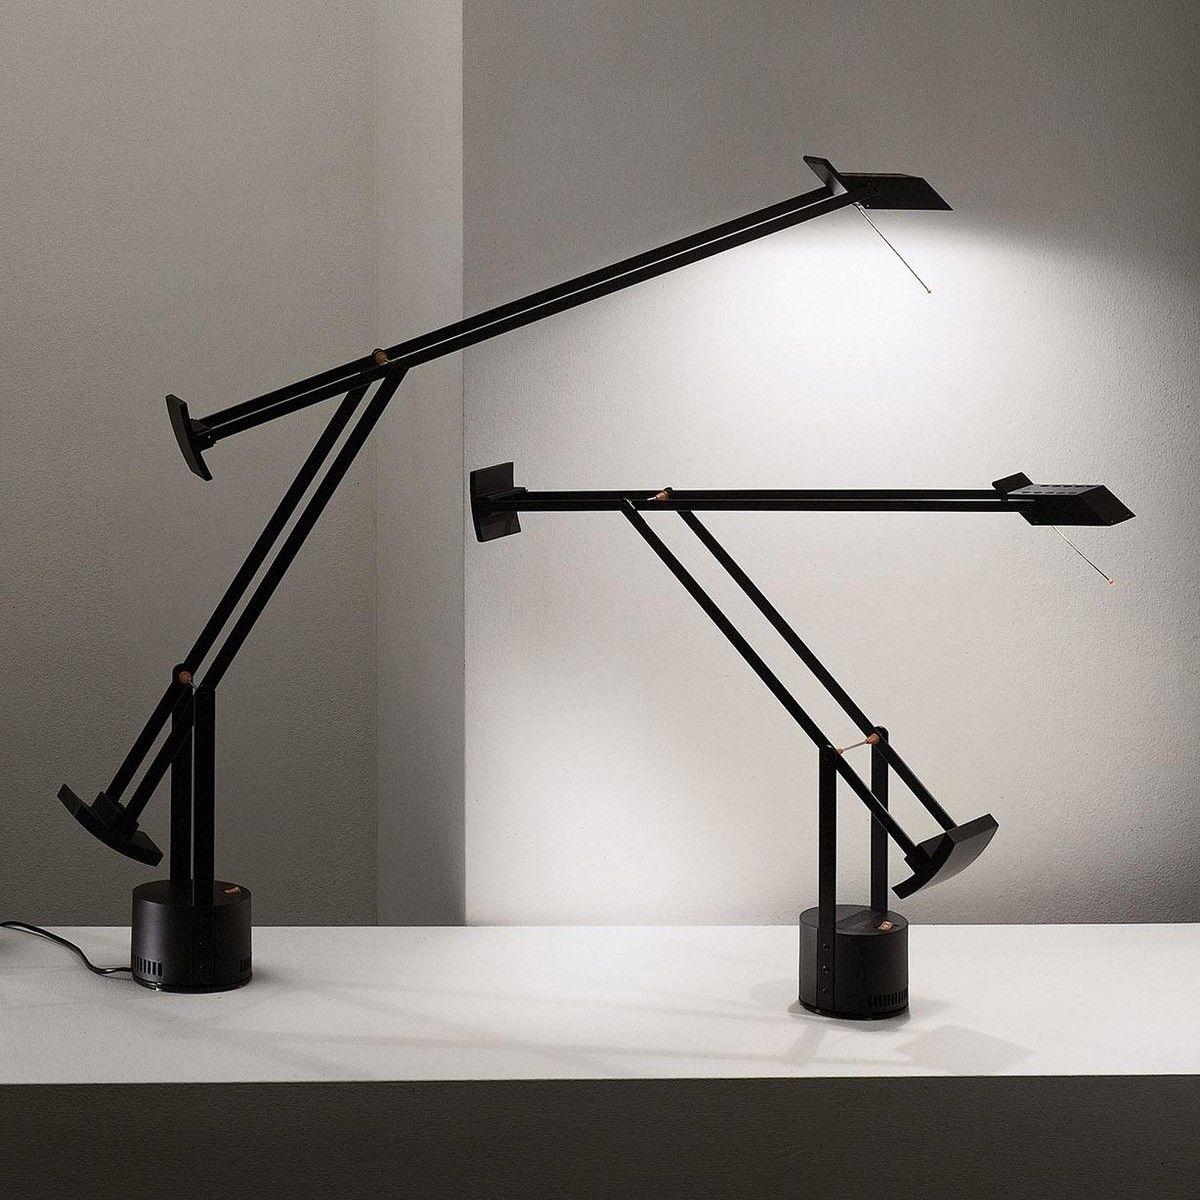 tizio led desk lamp  artemide  ambientedirectcom - artemide  tizio led desk lamp